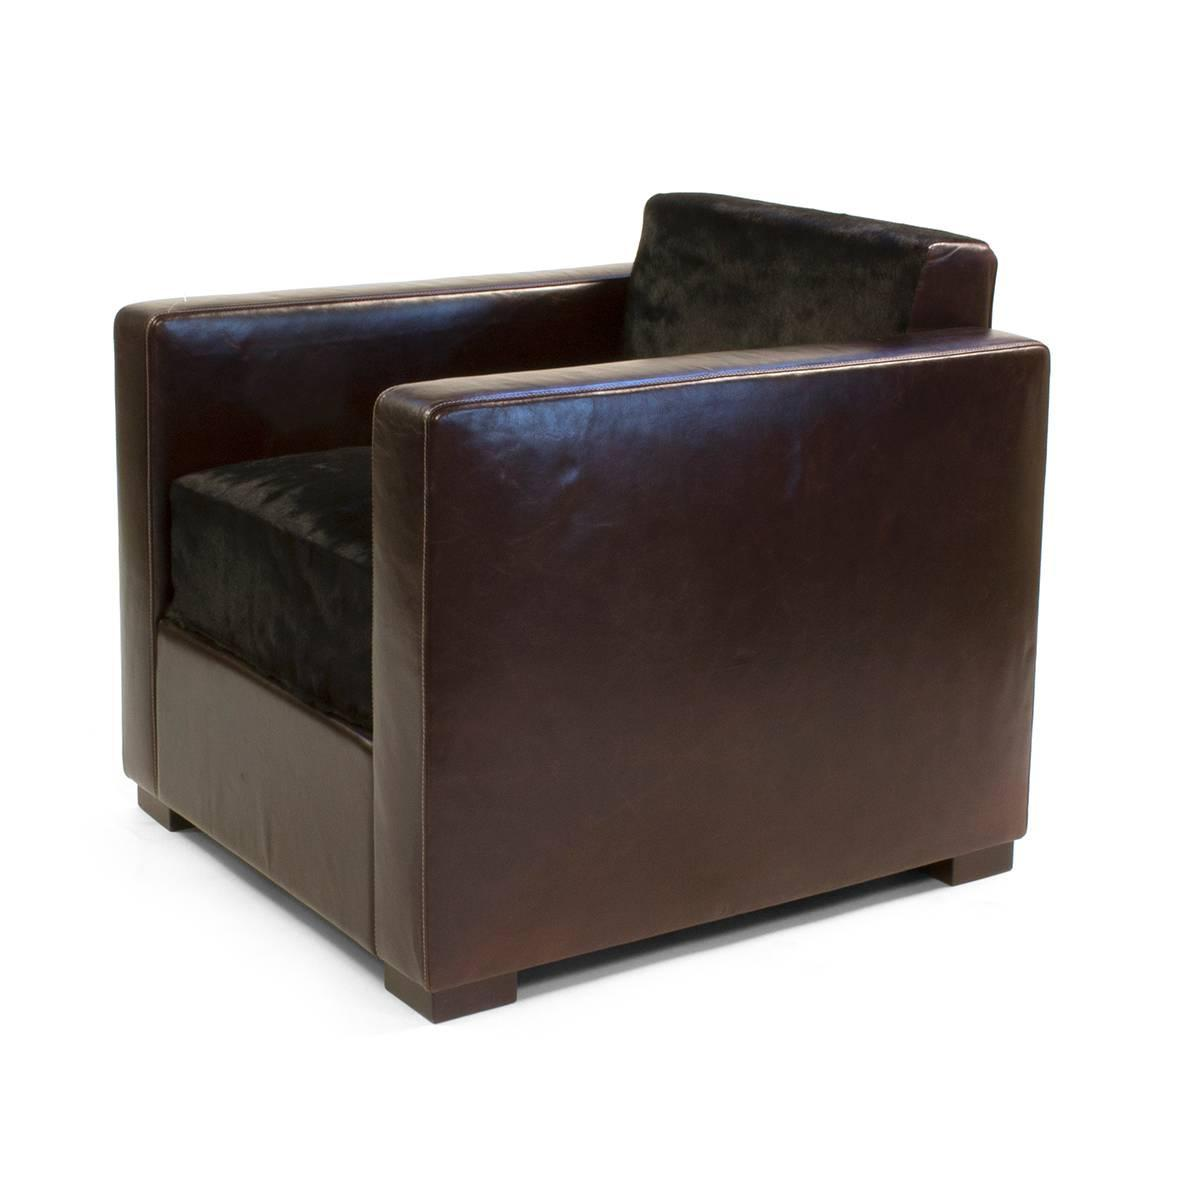 Poltrona Frau Leather And Pony Skin Linea A Armchair By